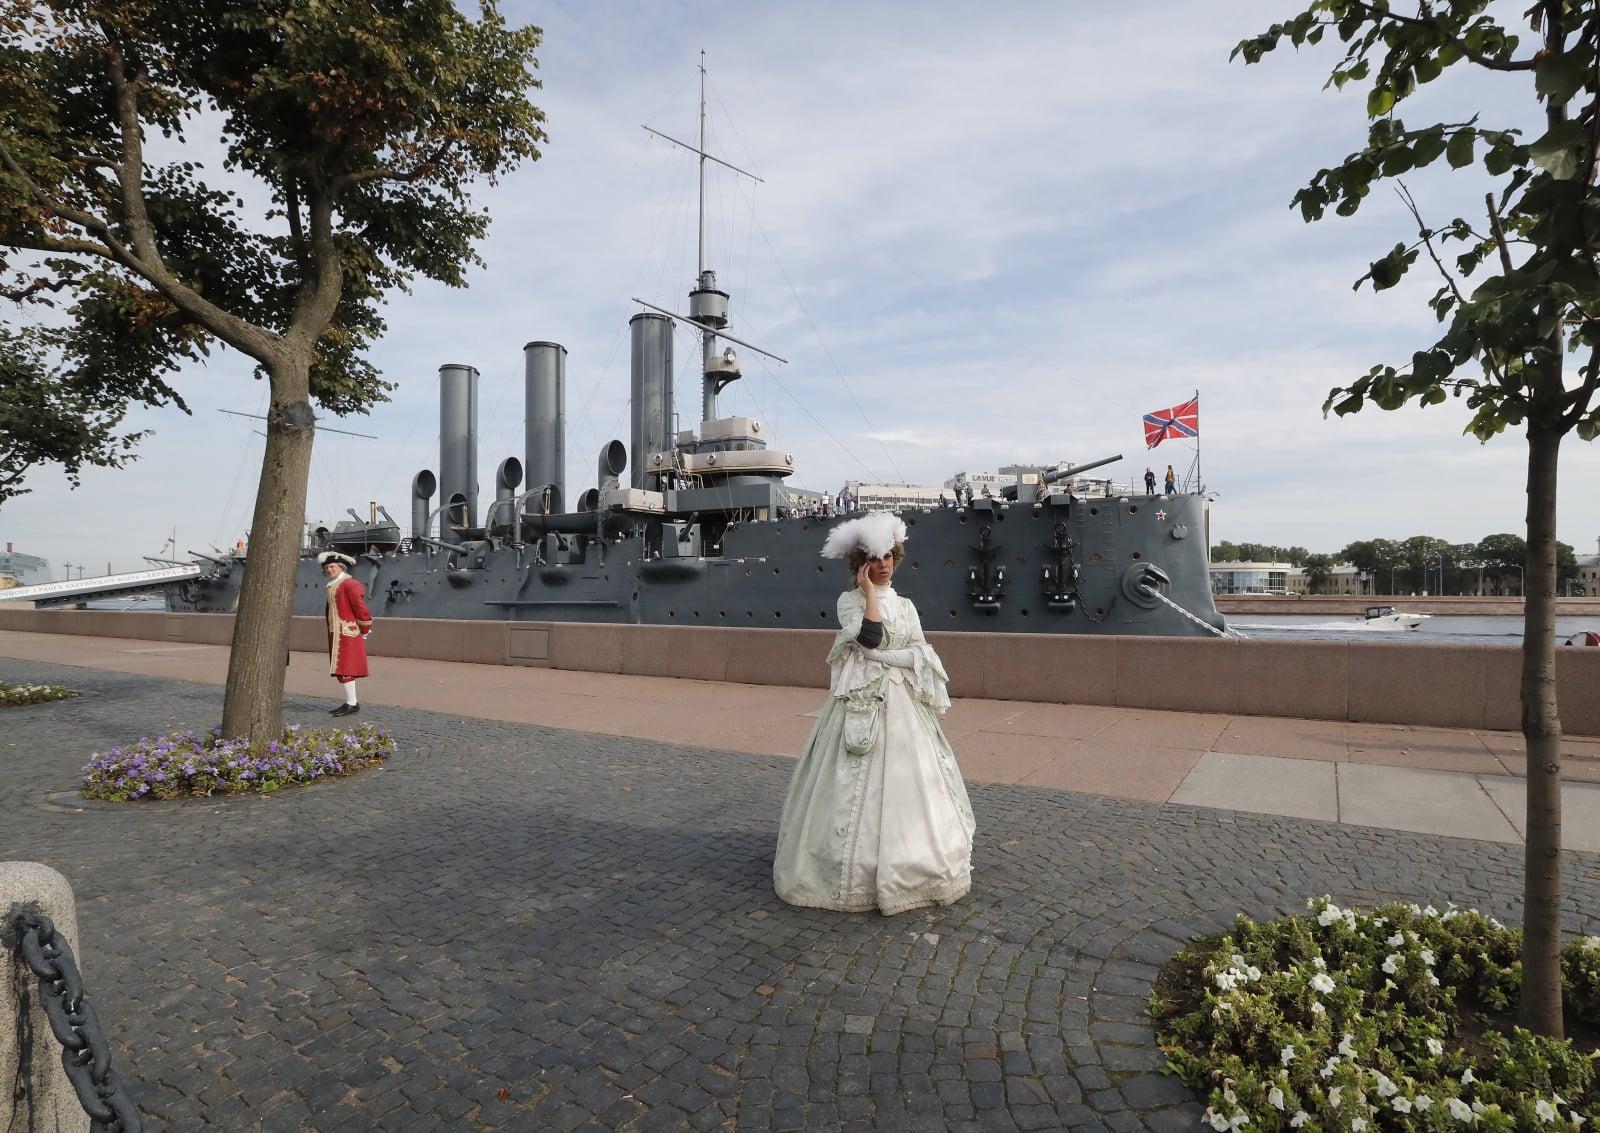 Krążownik Aurora fot. EPA/ANATOLY MALTSEV